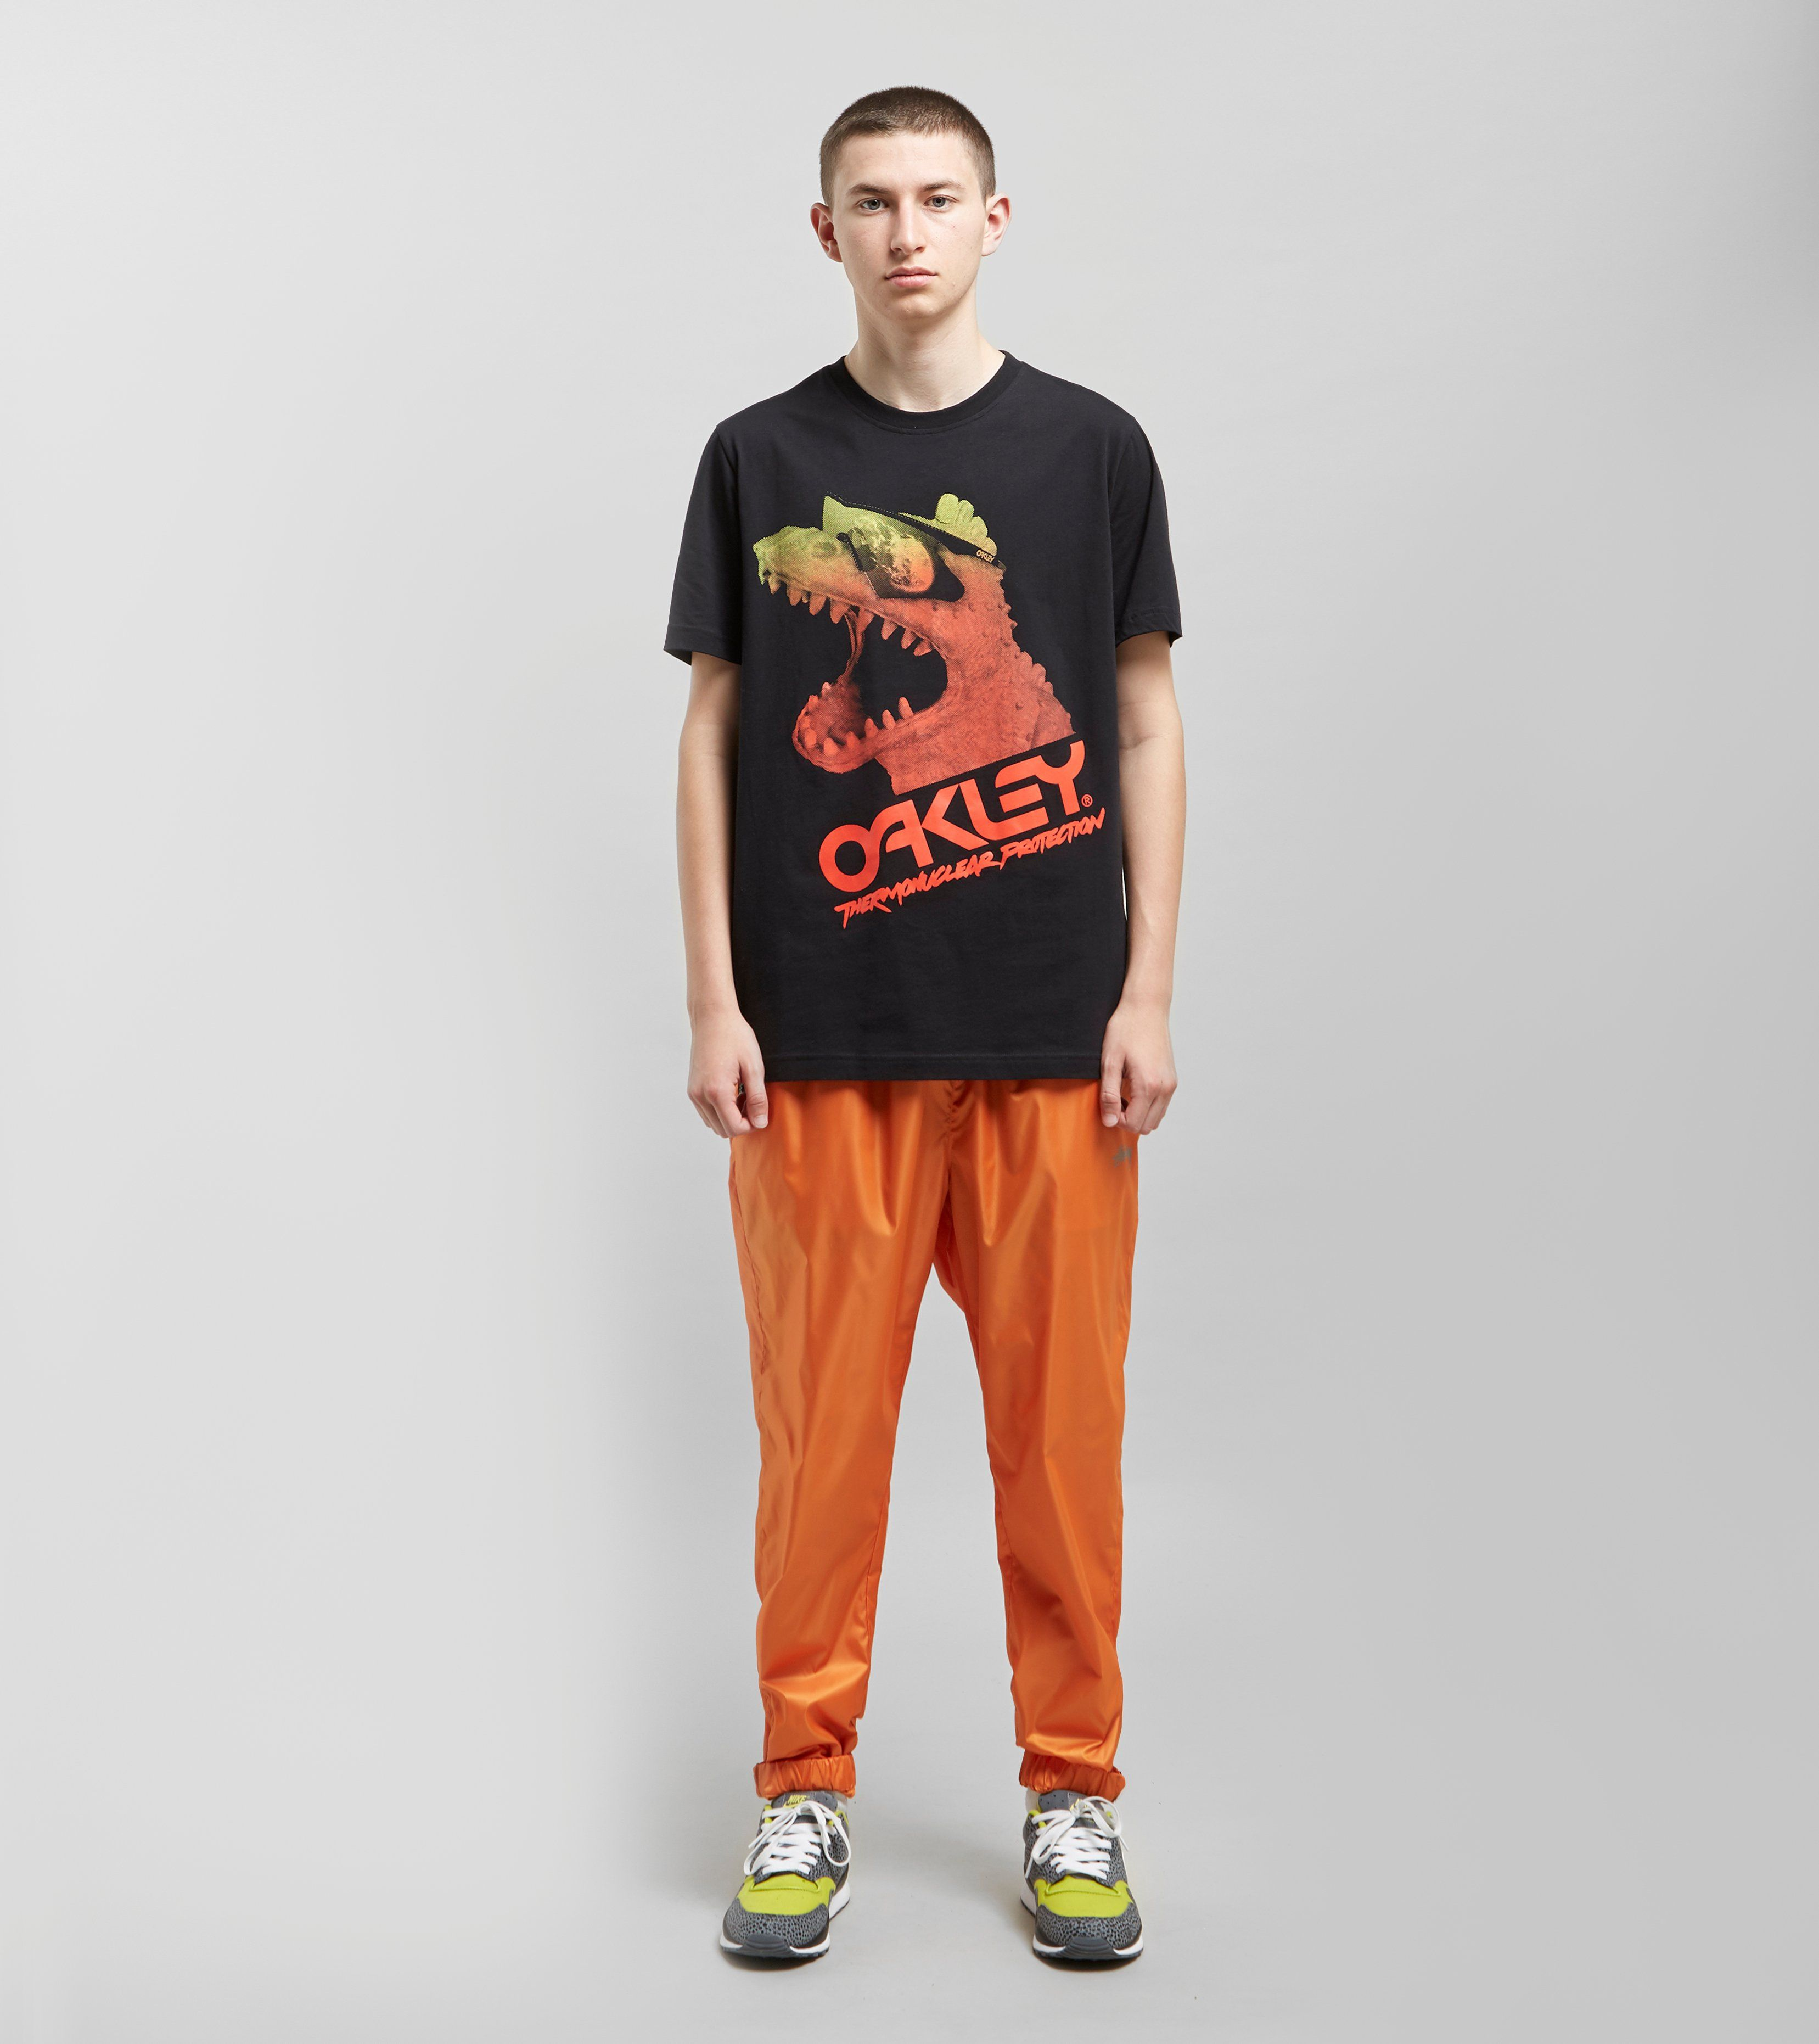 Oakley TNP Dino T-Shirt